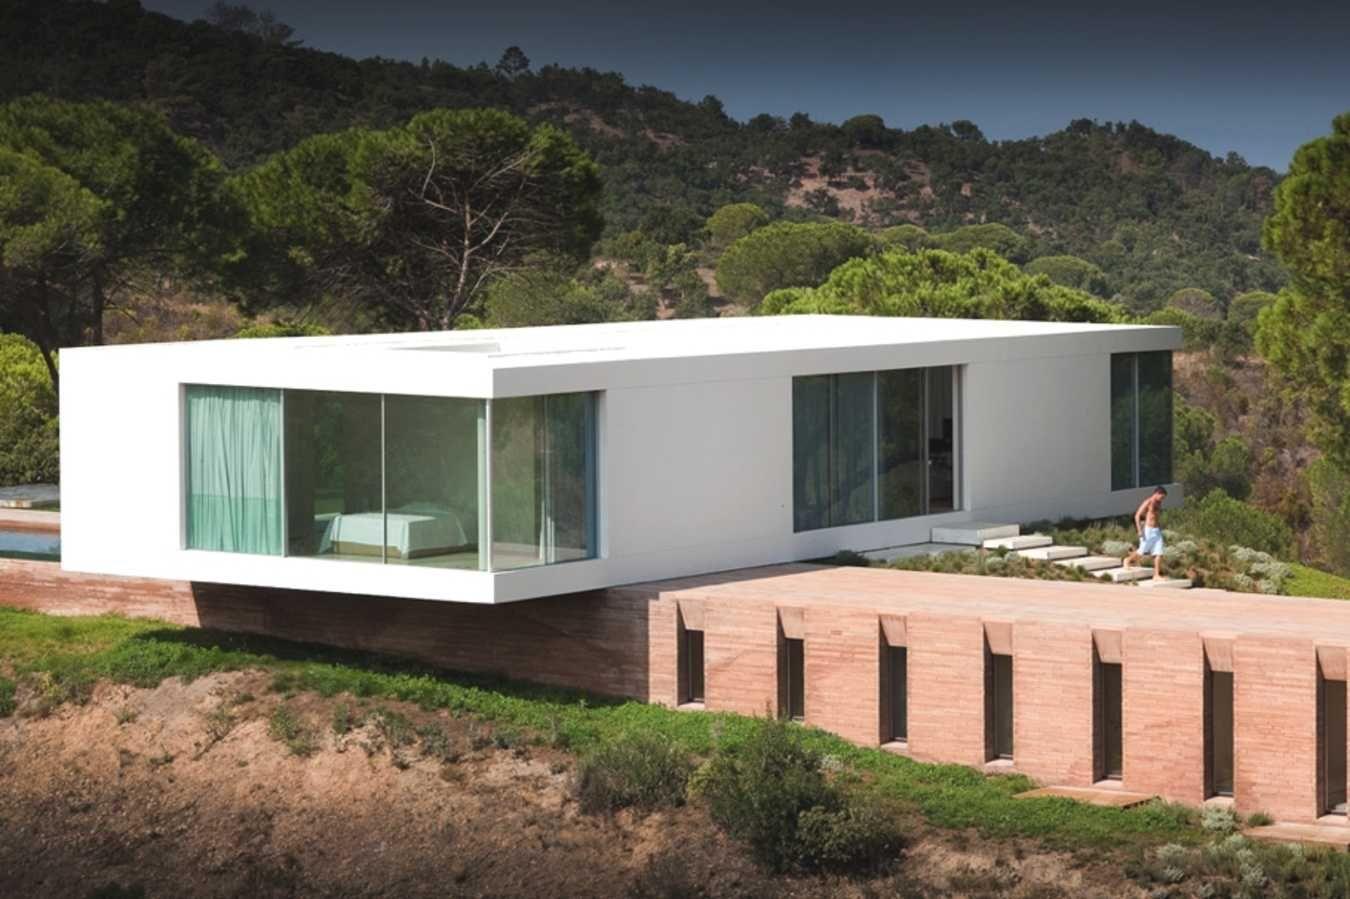 Minimal House in Melides, Portugal | Moderne häuser, Visualisierung ...